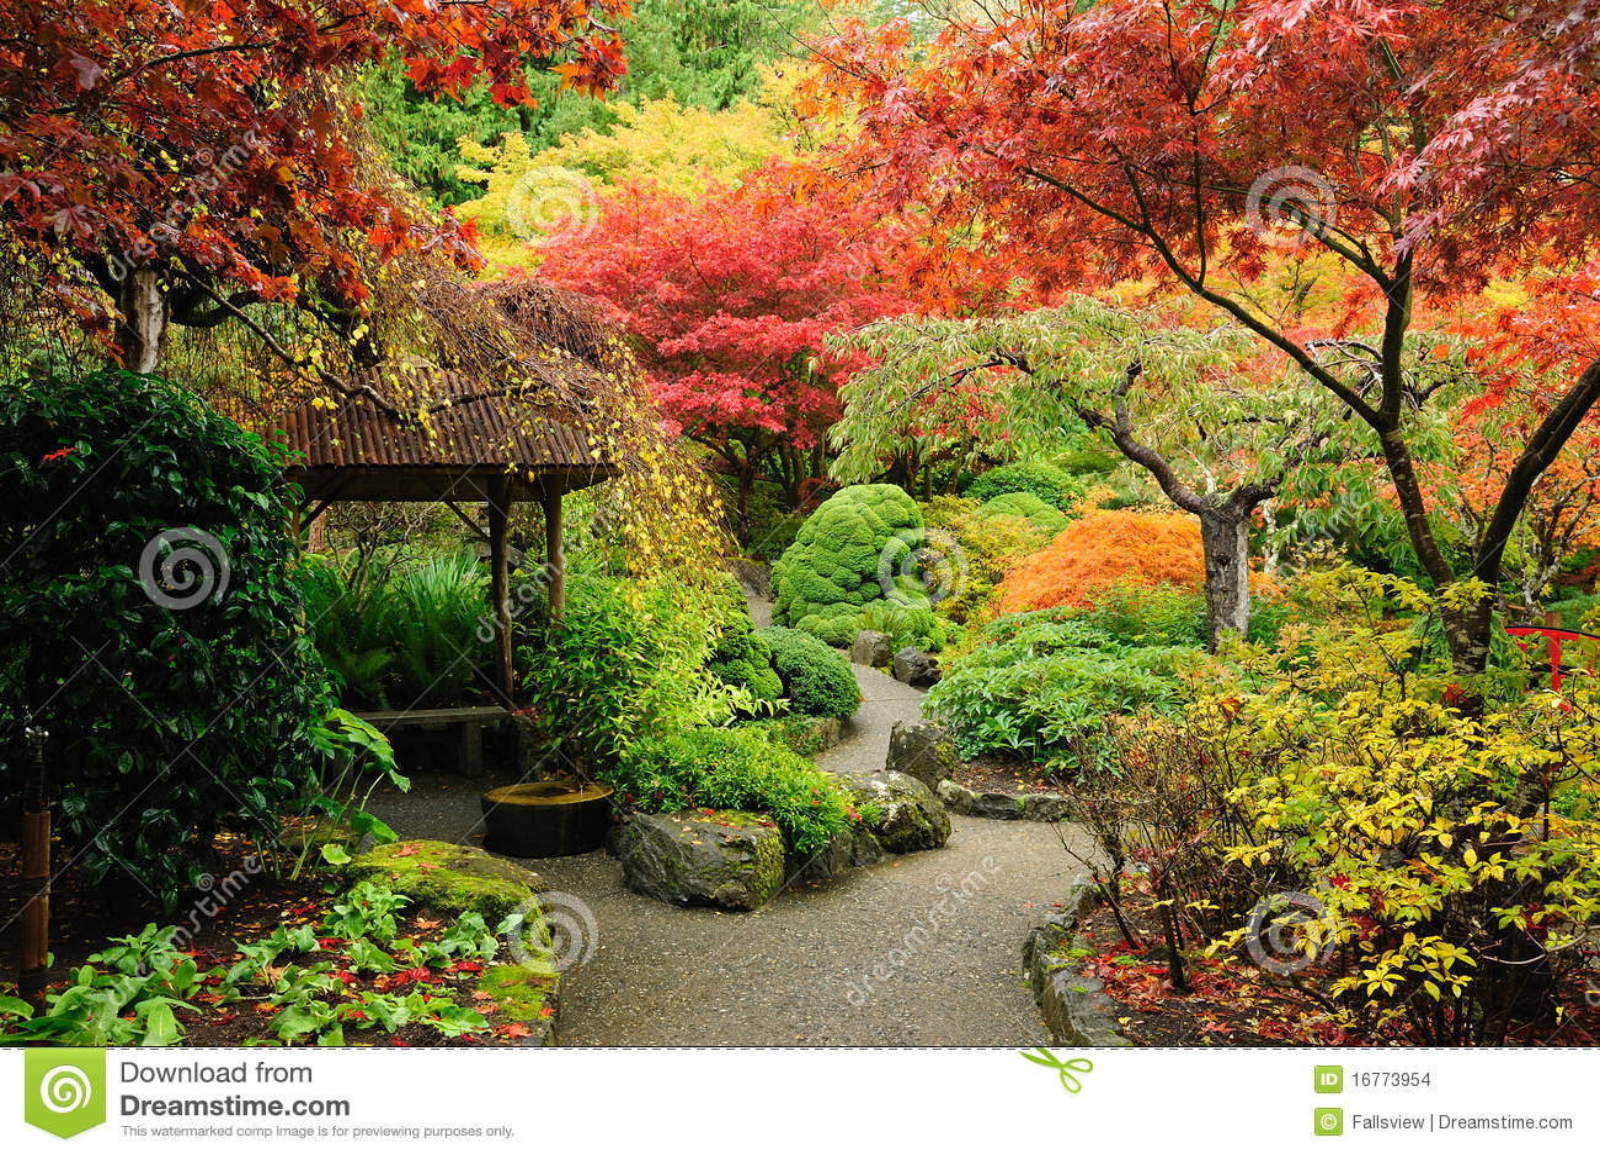 Maple Leaf Wallpaper For Fall Season Autumn Japanese Garden Stock Images Image 16773954